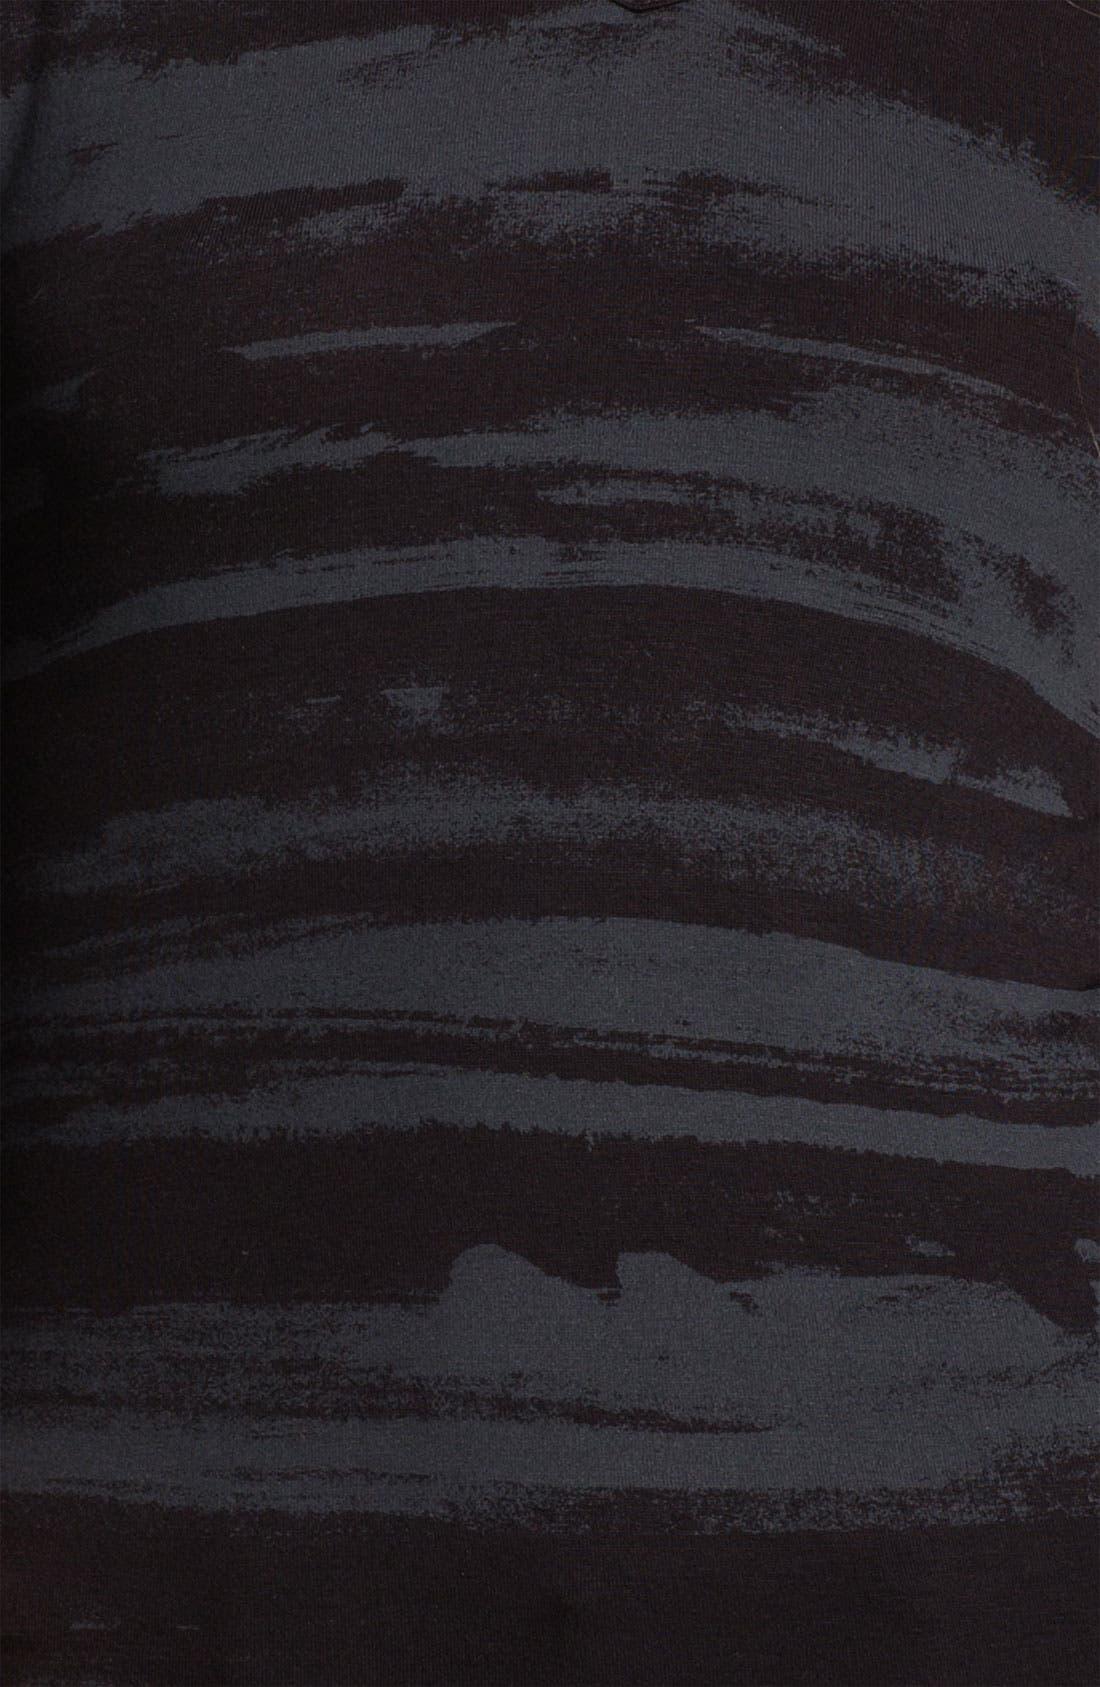 Alternate Image 3  - Edista 'Leona' V-Neck Top (Petite)